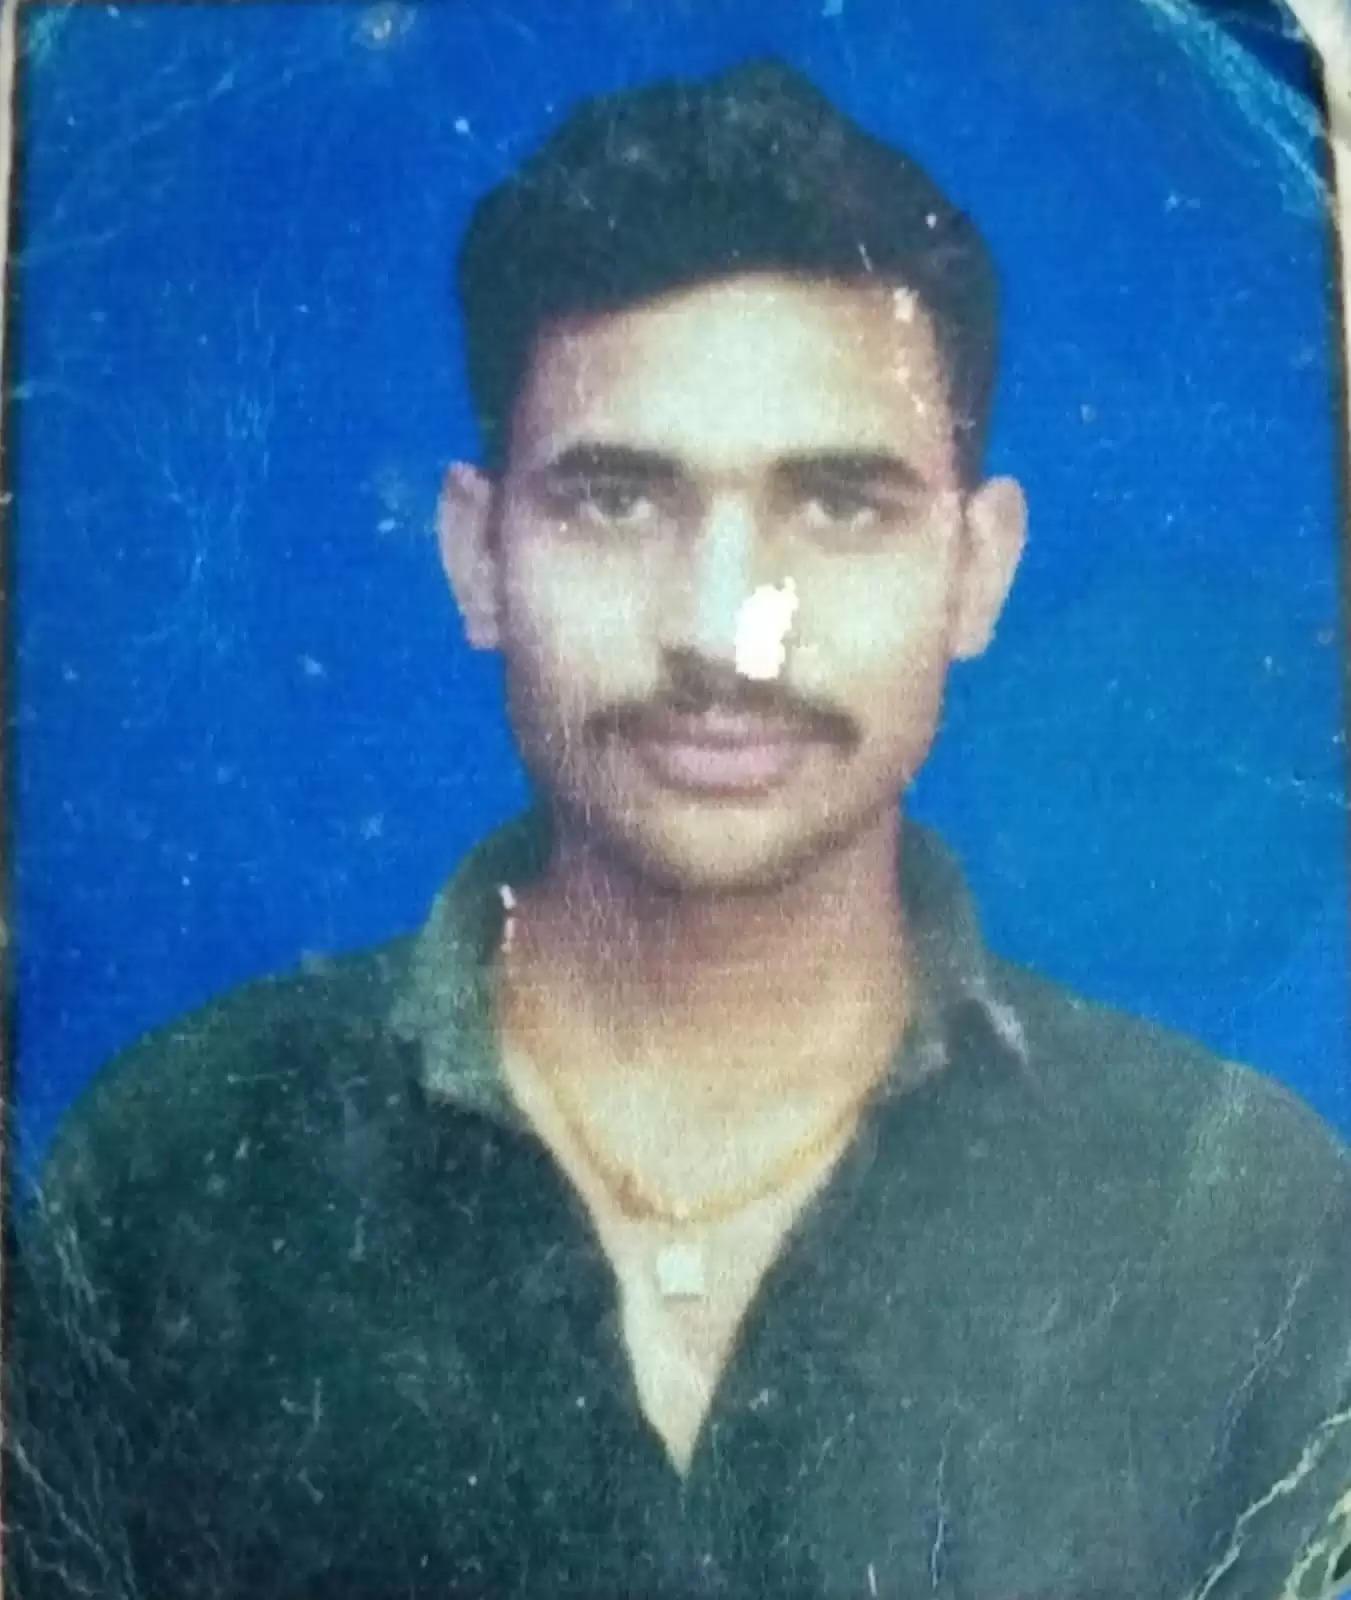 Babu Yadav is missing